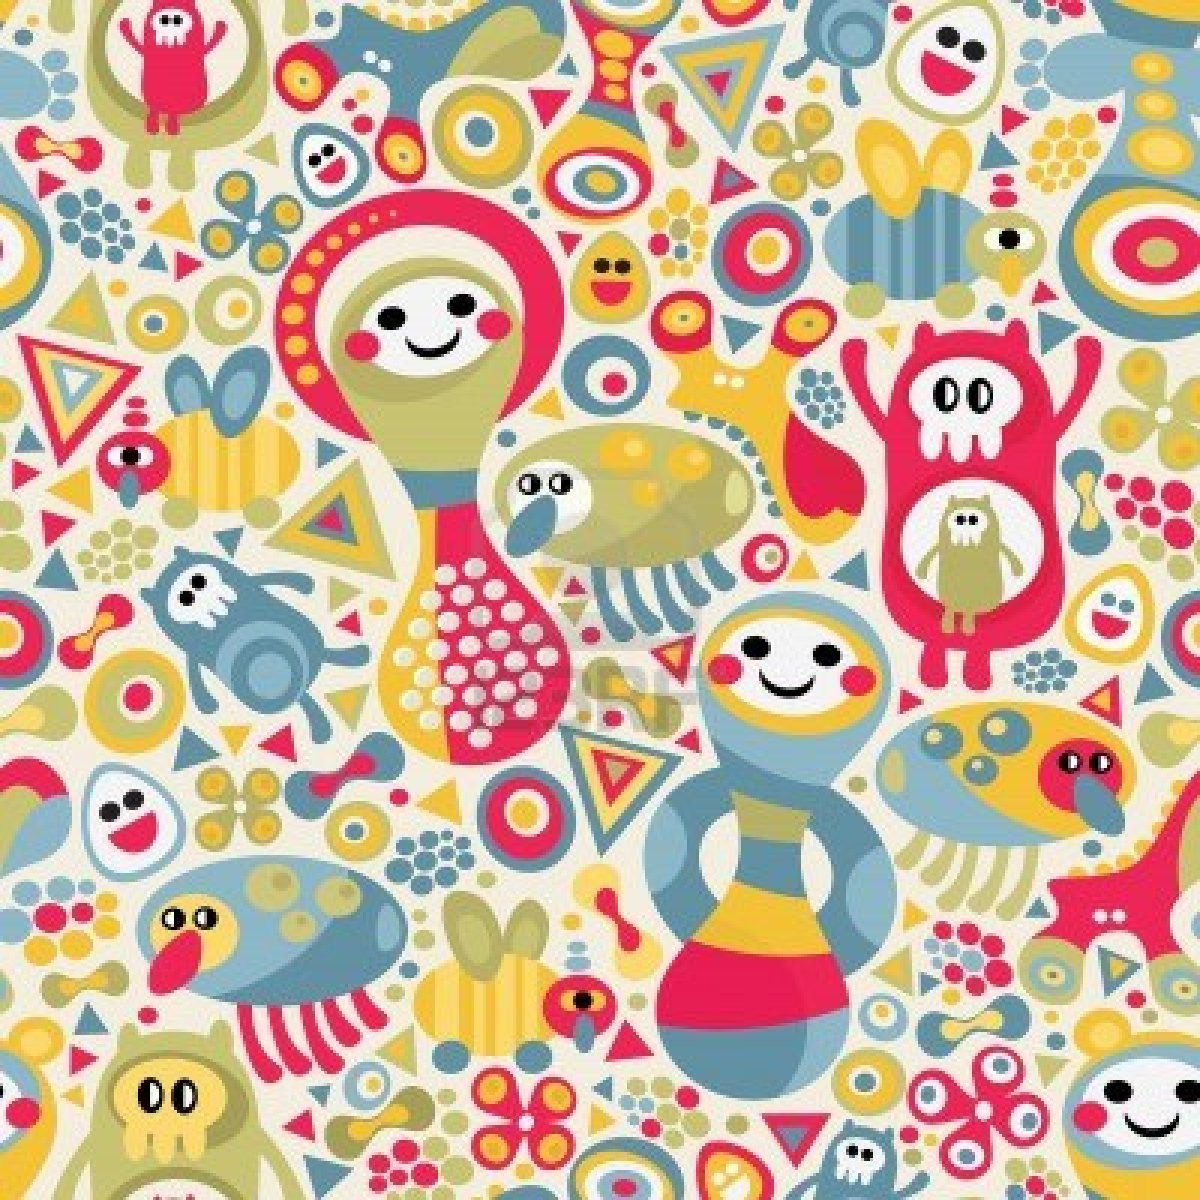 Cute Girly Skull Wallpapers Cute Pattern Wallpaper 27 Wallpapers Adorable Wallpapers